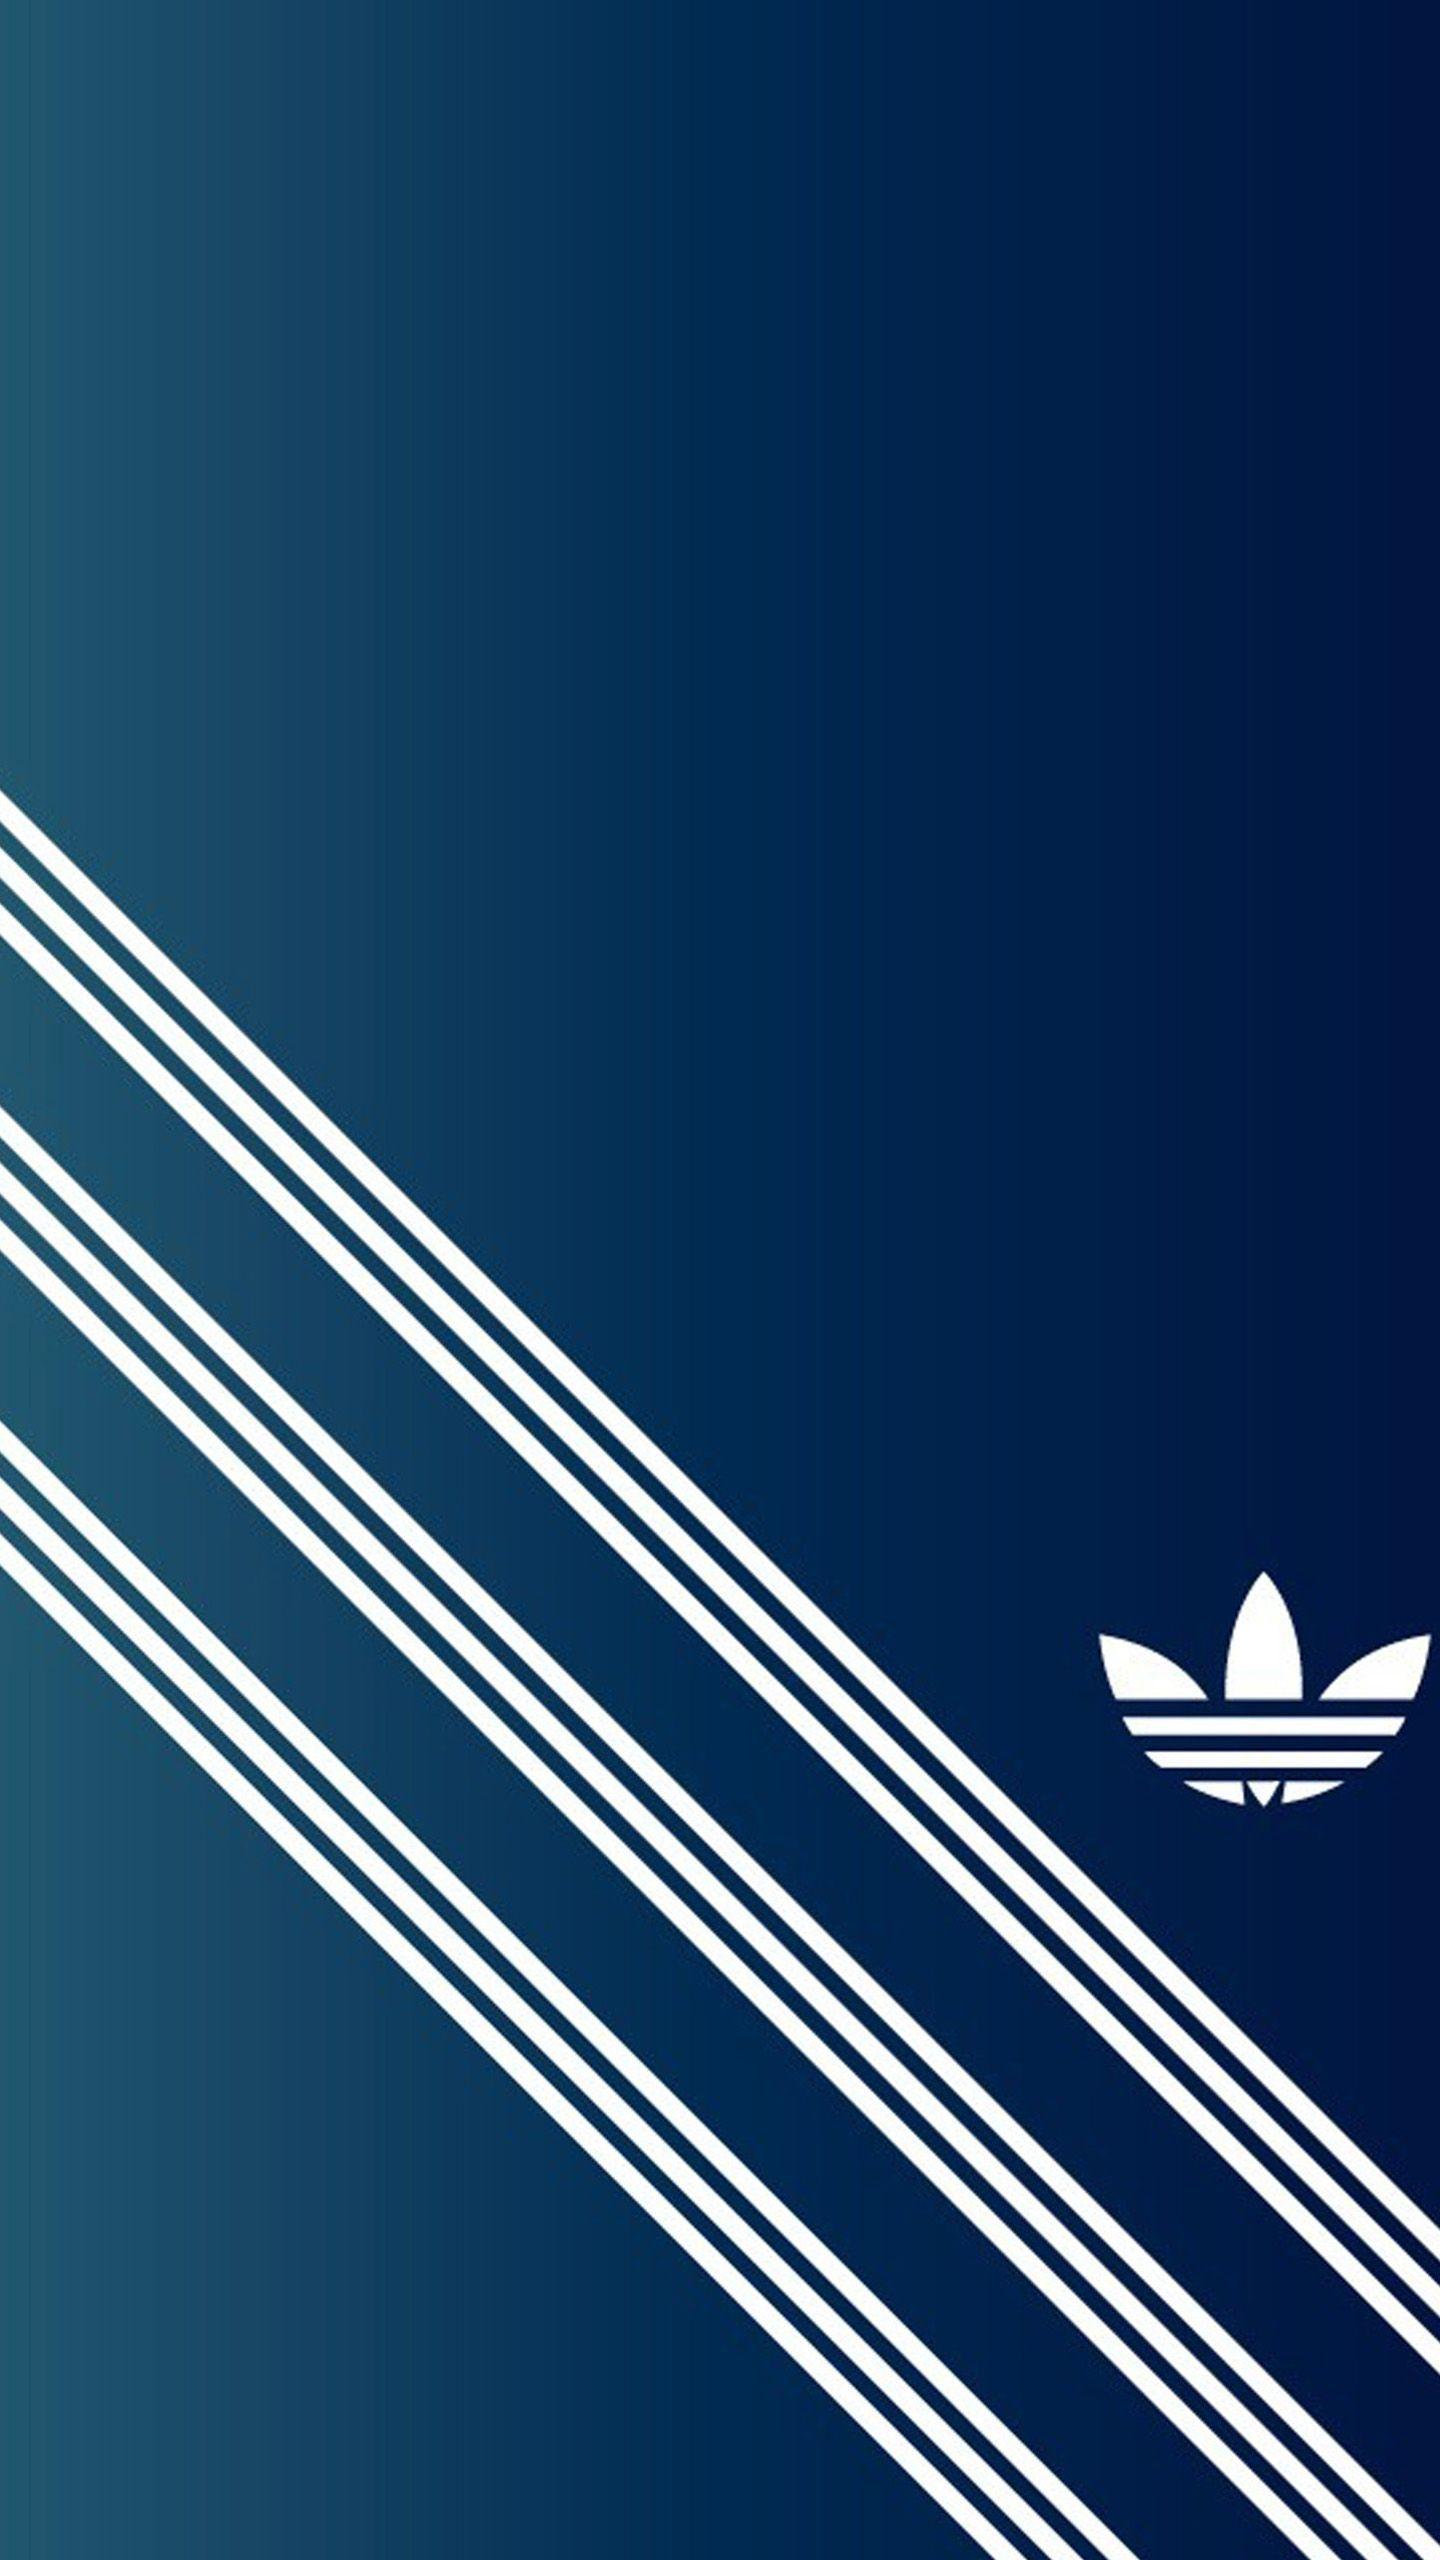 1440x2560 Adidas Iphone Wallpaper Free Download Adidas Wallpapers Adidas Iphone Wallpaper Adidas Wallpaper Iphone Adidas wallpaper iphone x